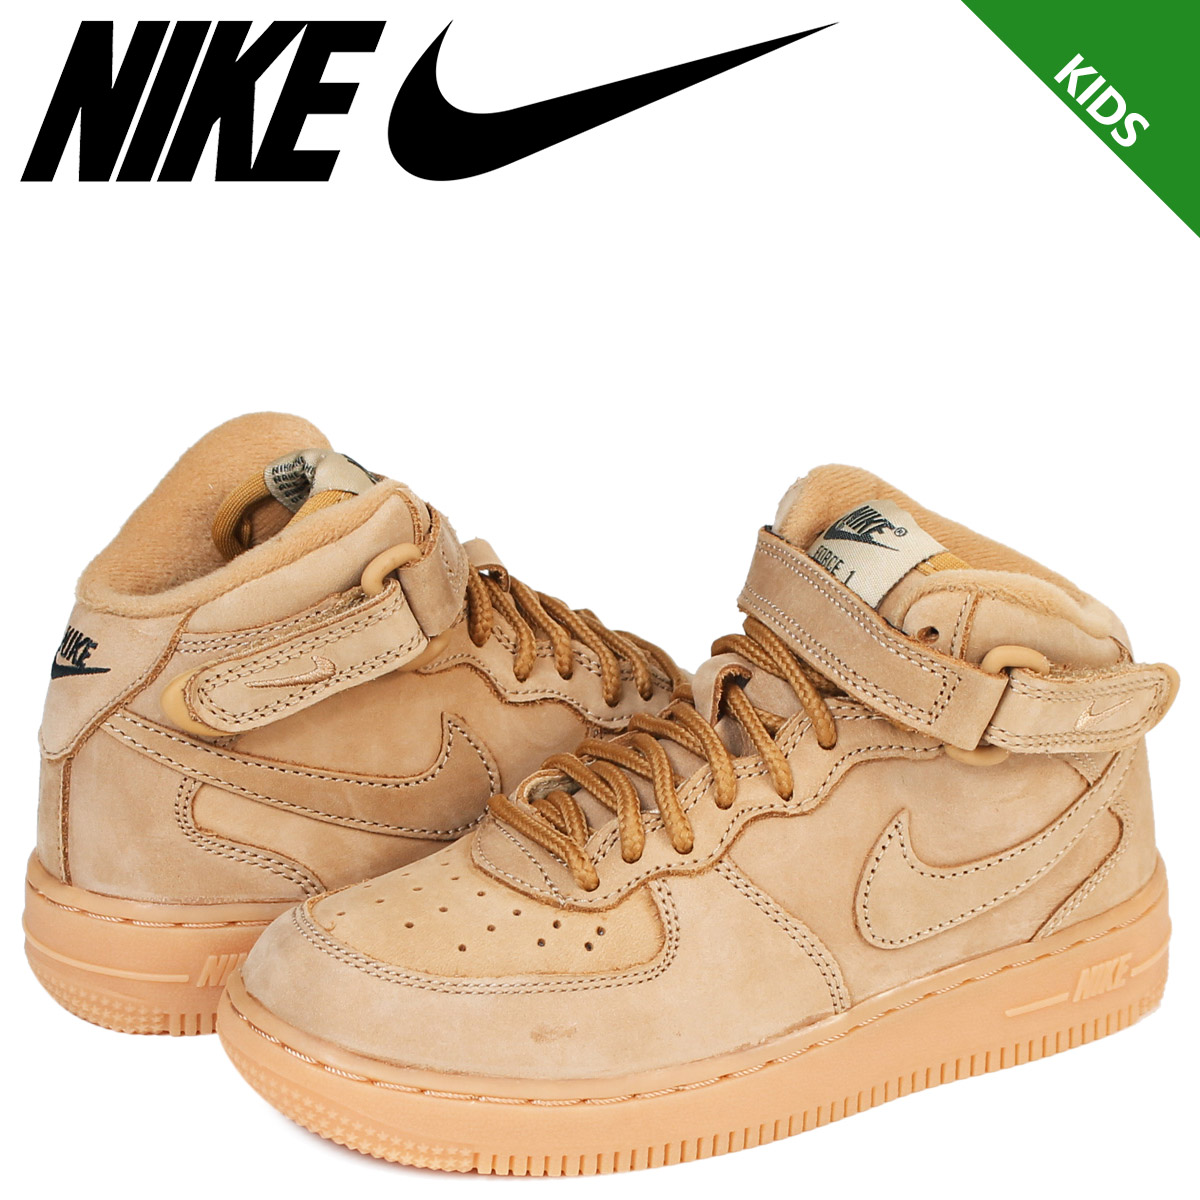 8cf58a32fc [brand NIKE getting high popularity from sneakers freak]. ・Kids model of  constant seller model